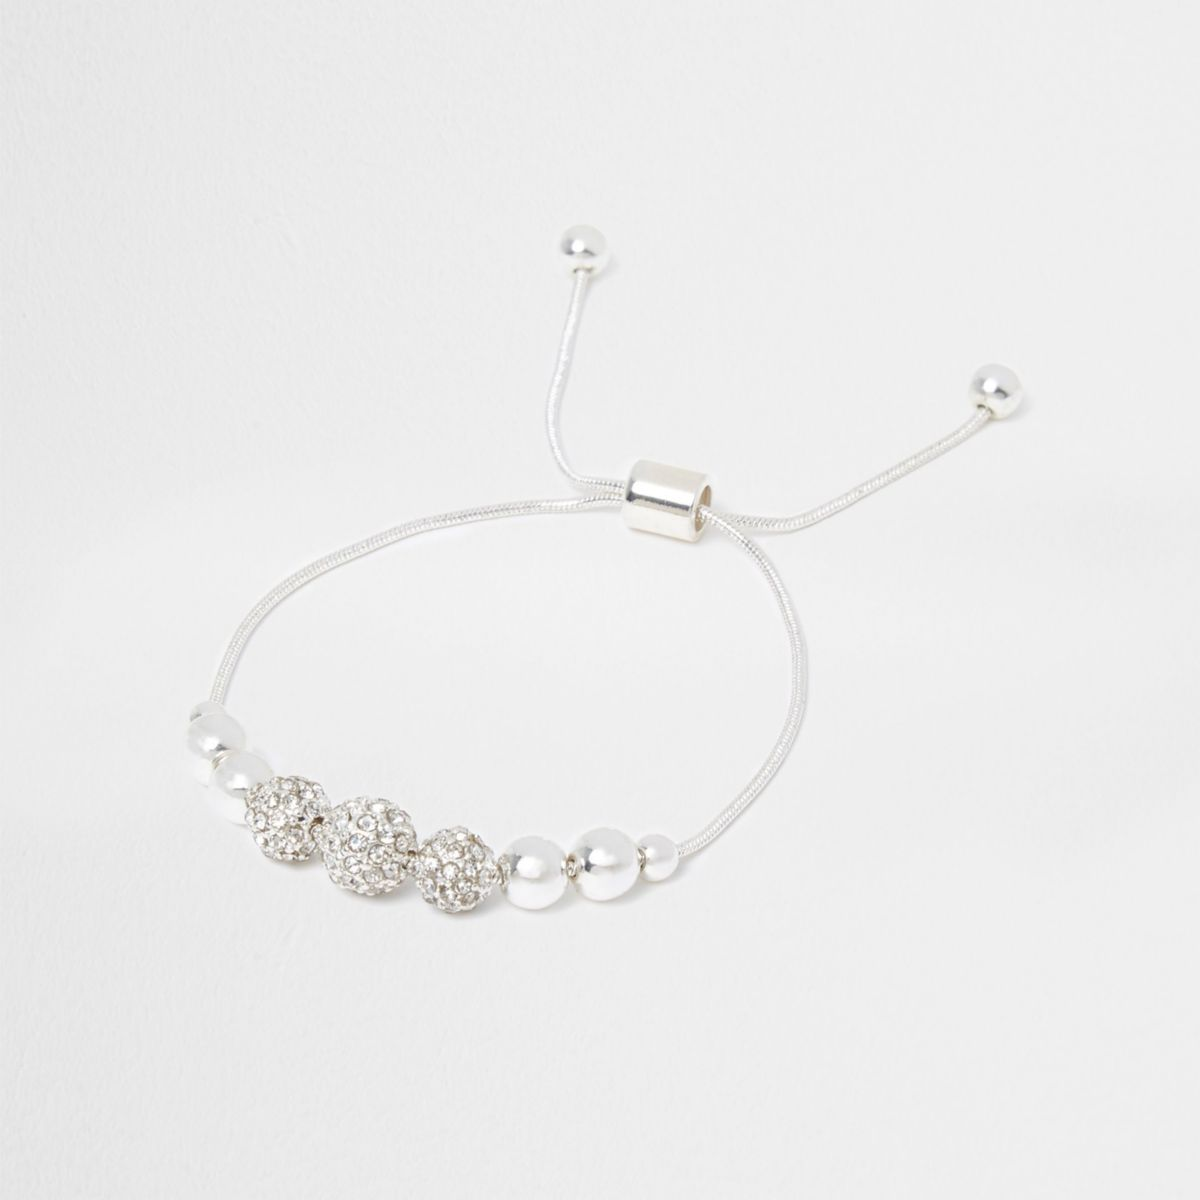 Silver tone rhinestone pave lariat bracelet